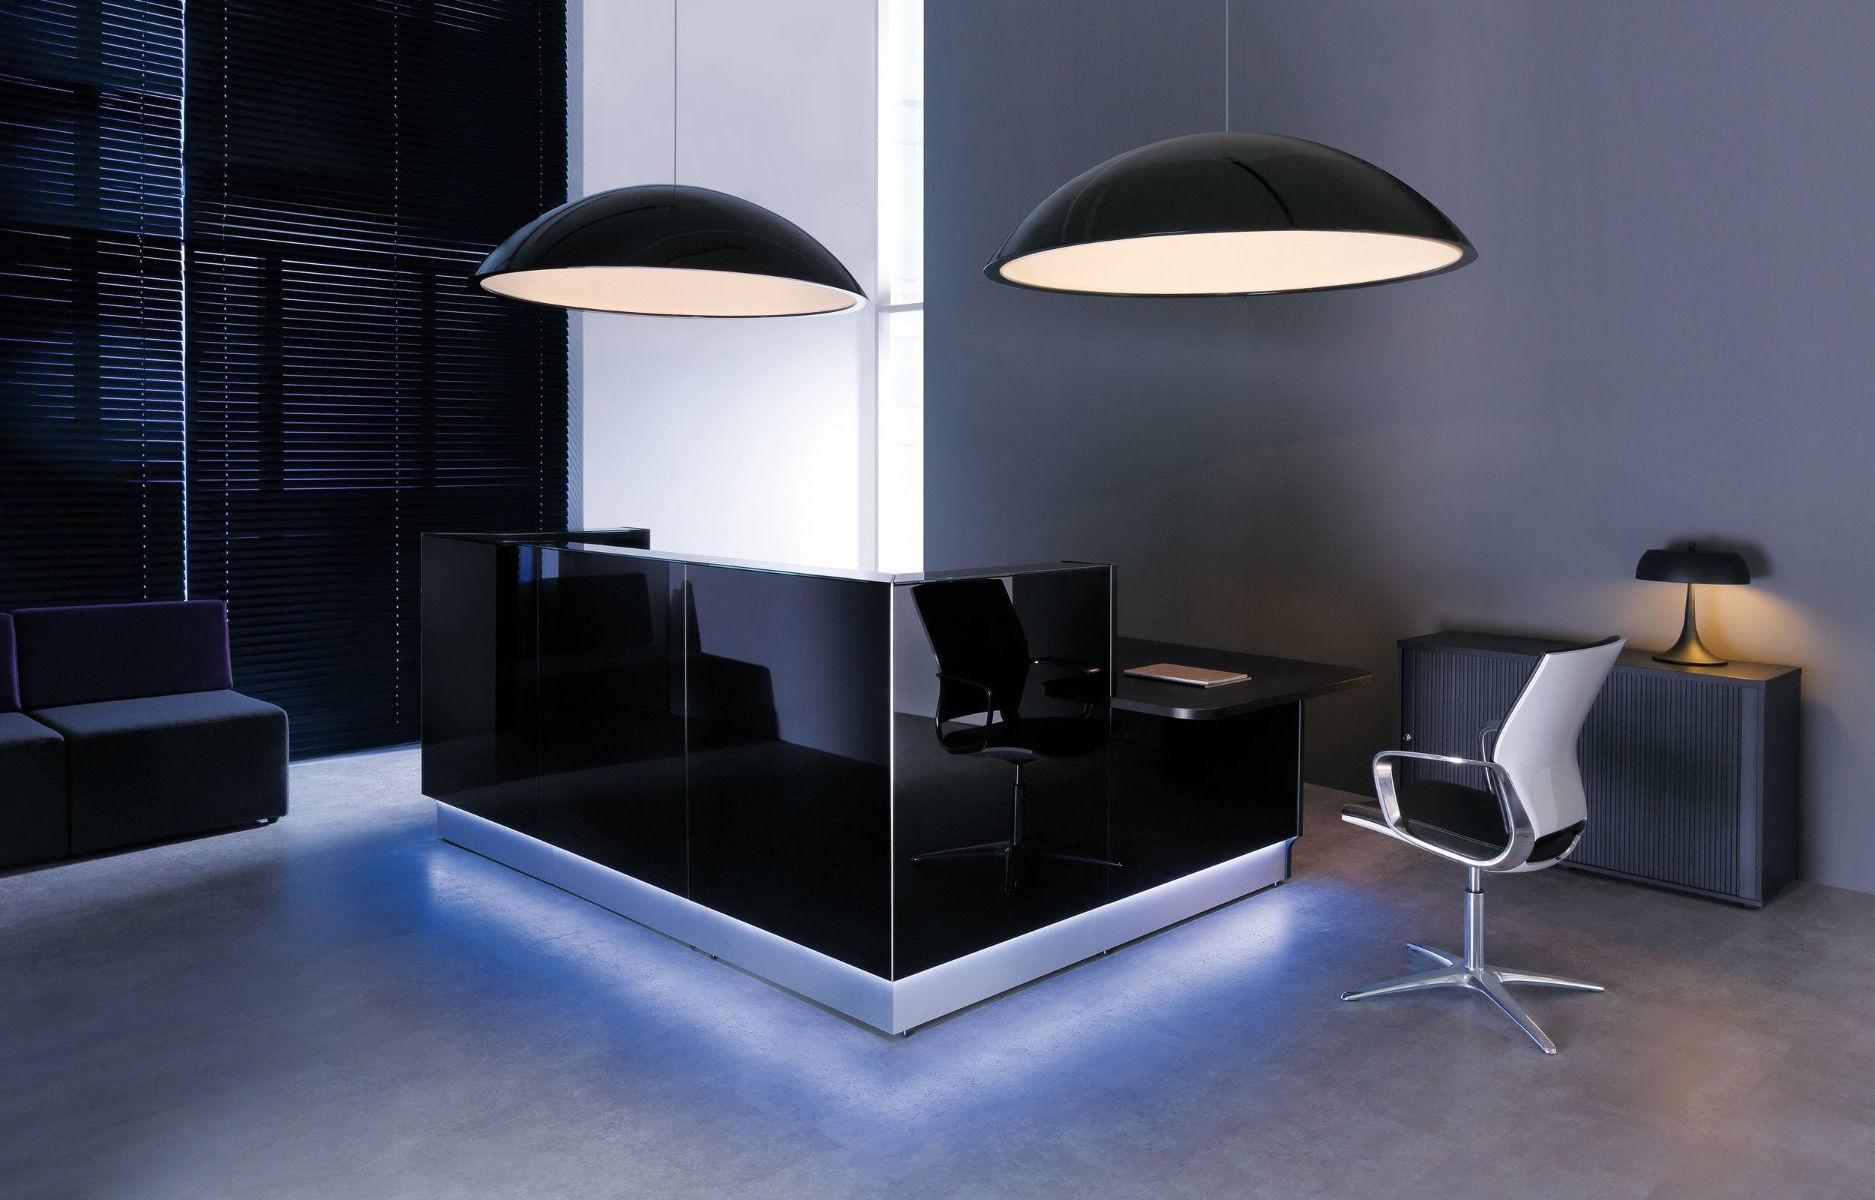 empfangstheken-arztpraxis-glastheken-schwarz-beleuchtung